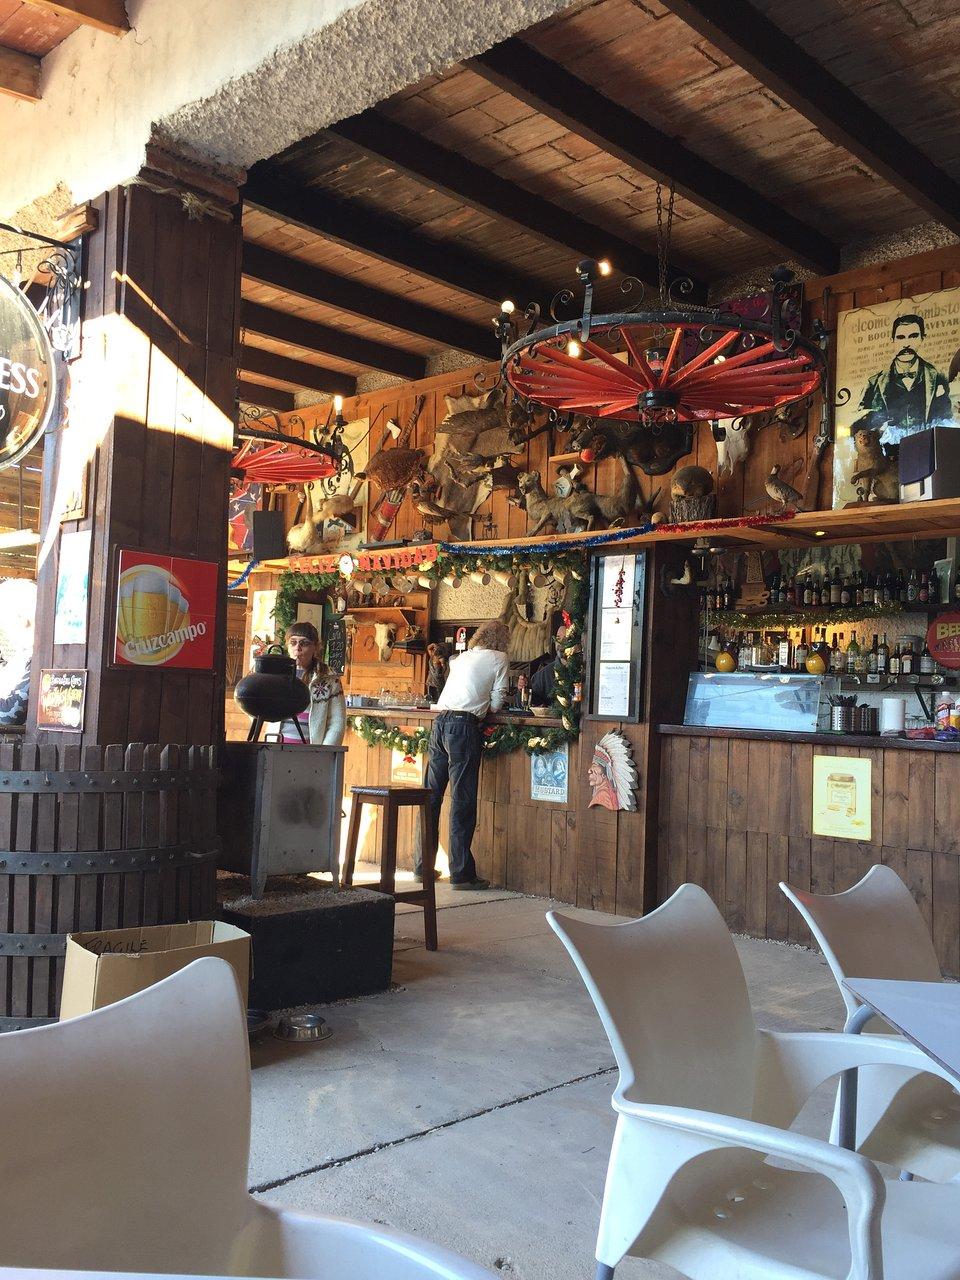 rastro don quijote (alicante) - aktuelle 2019 - lohnt es